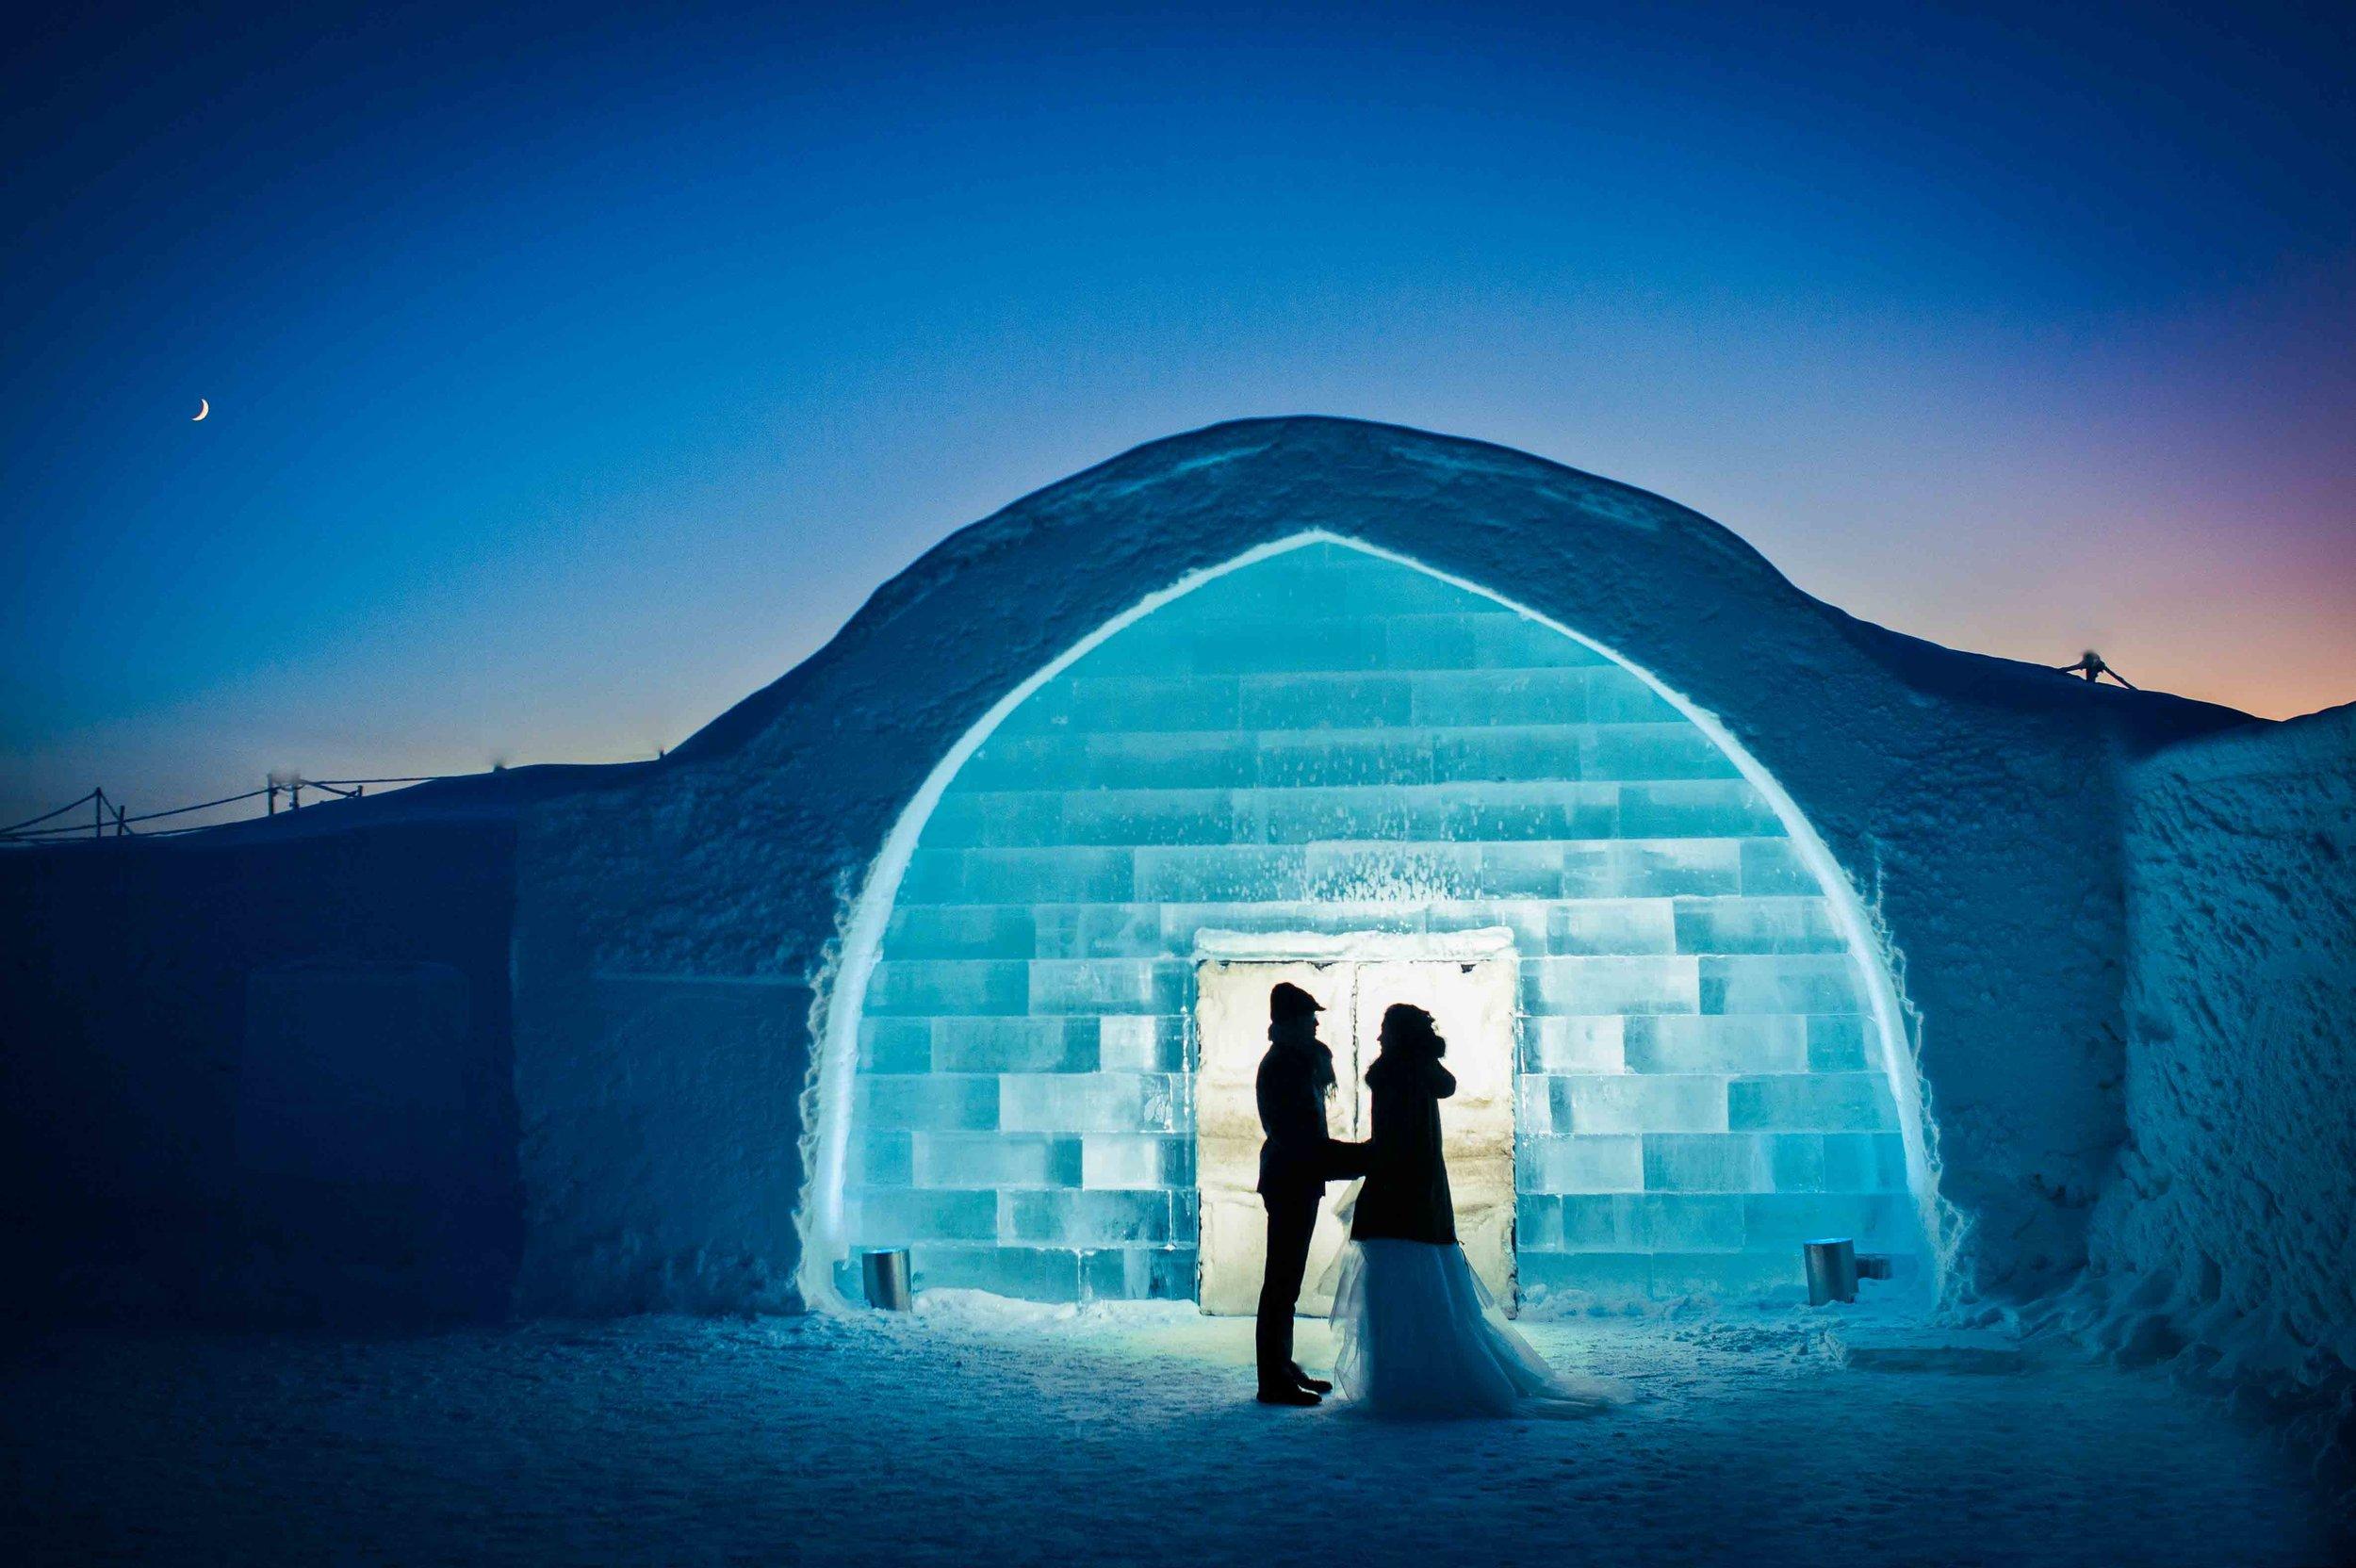 asaf kliger _ Wedding _icehotel (5 of 5)aaa.jpg